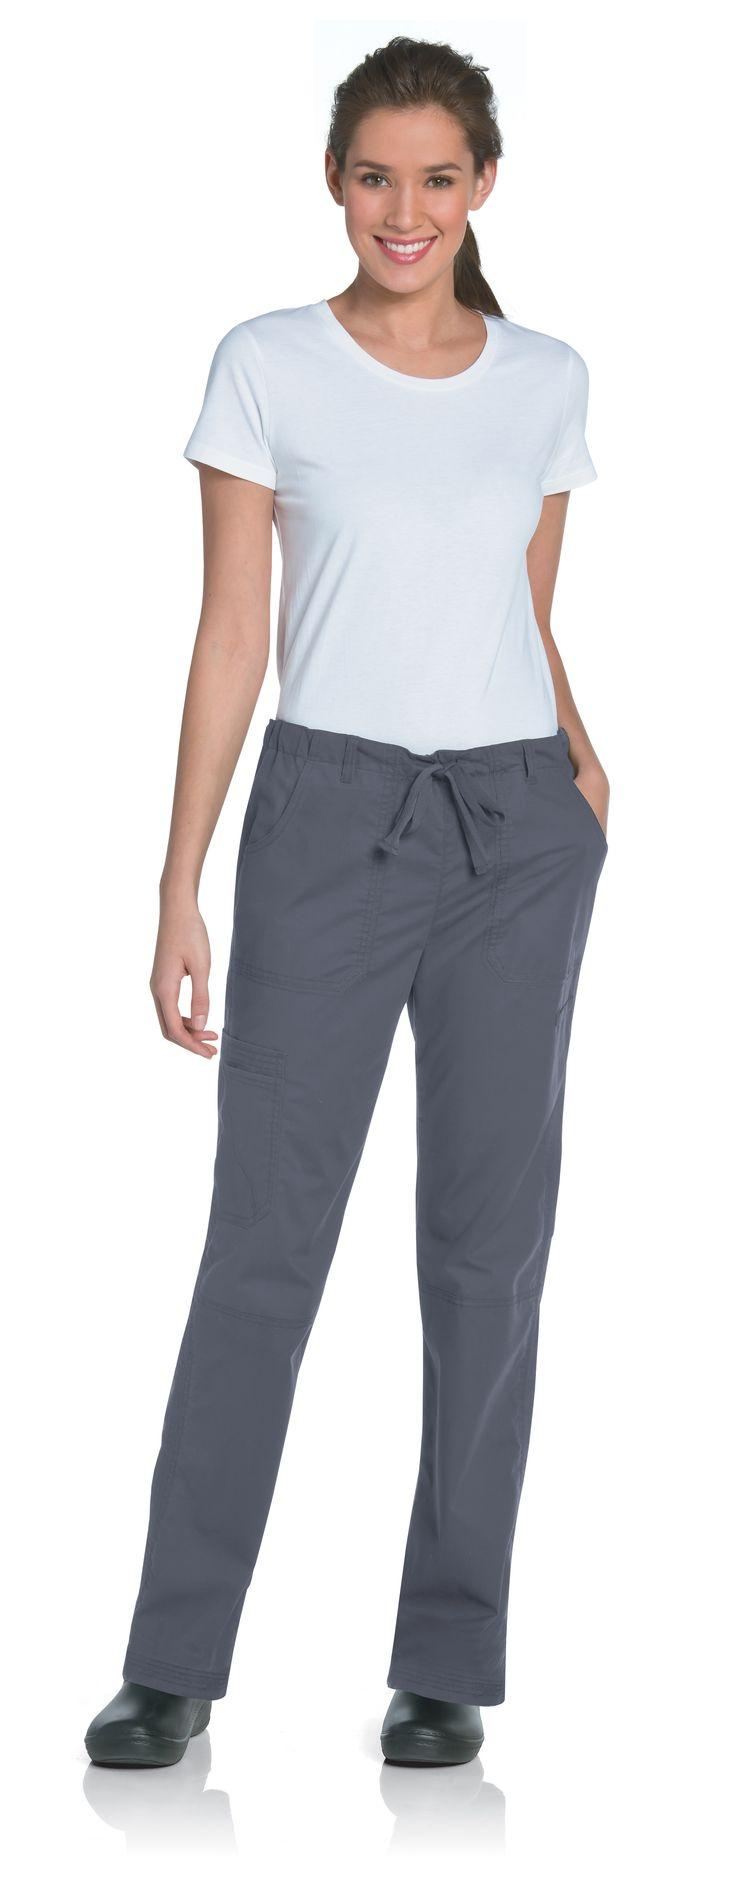 H-NEW! Landau's Prewashed Collection - 2024 Women's Cargo Pant